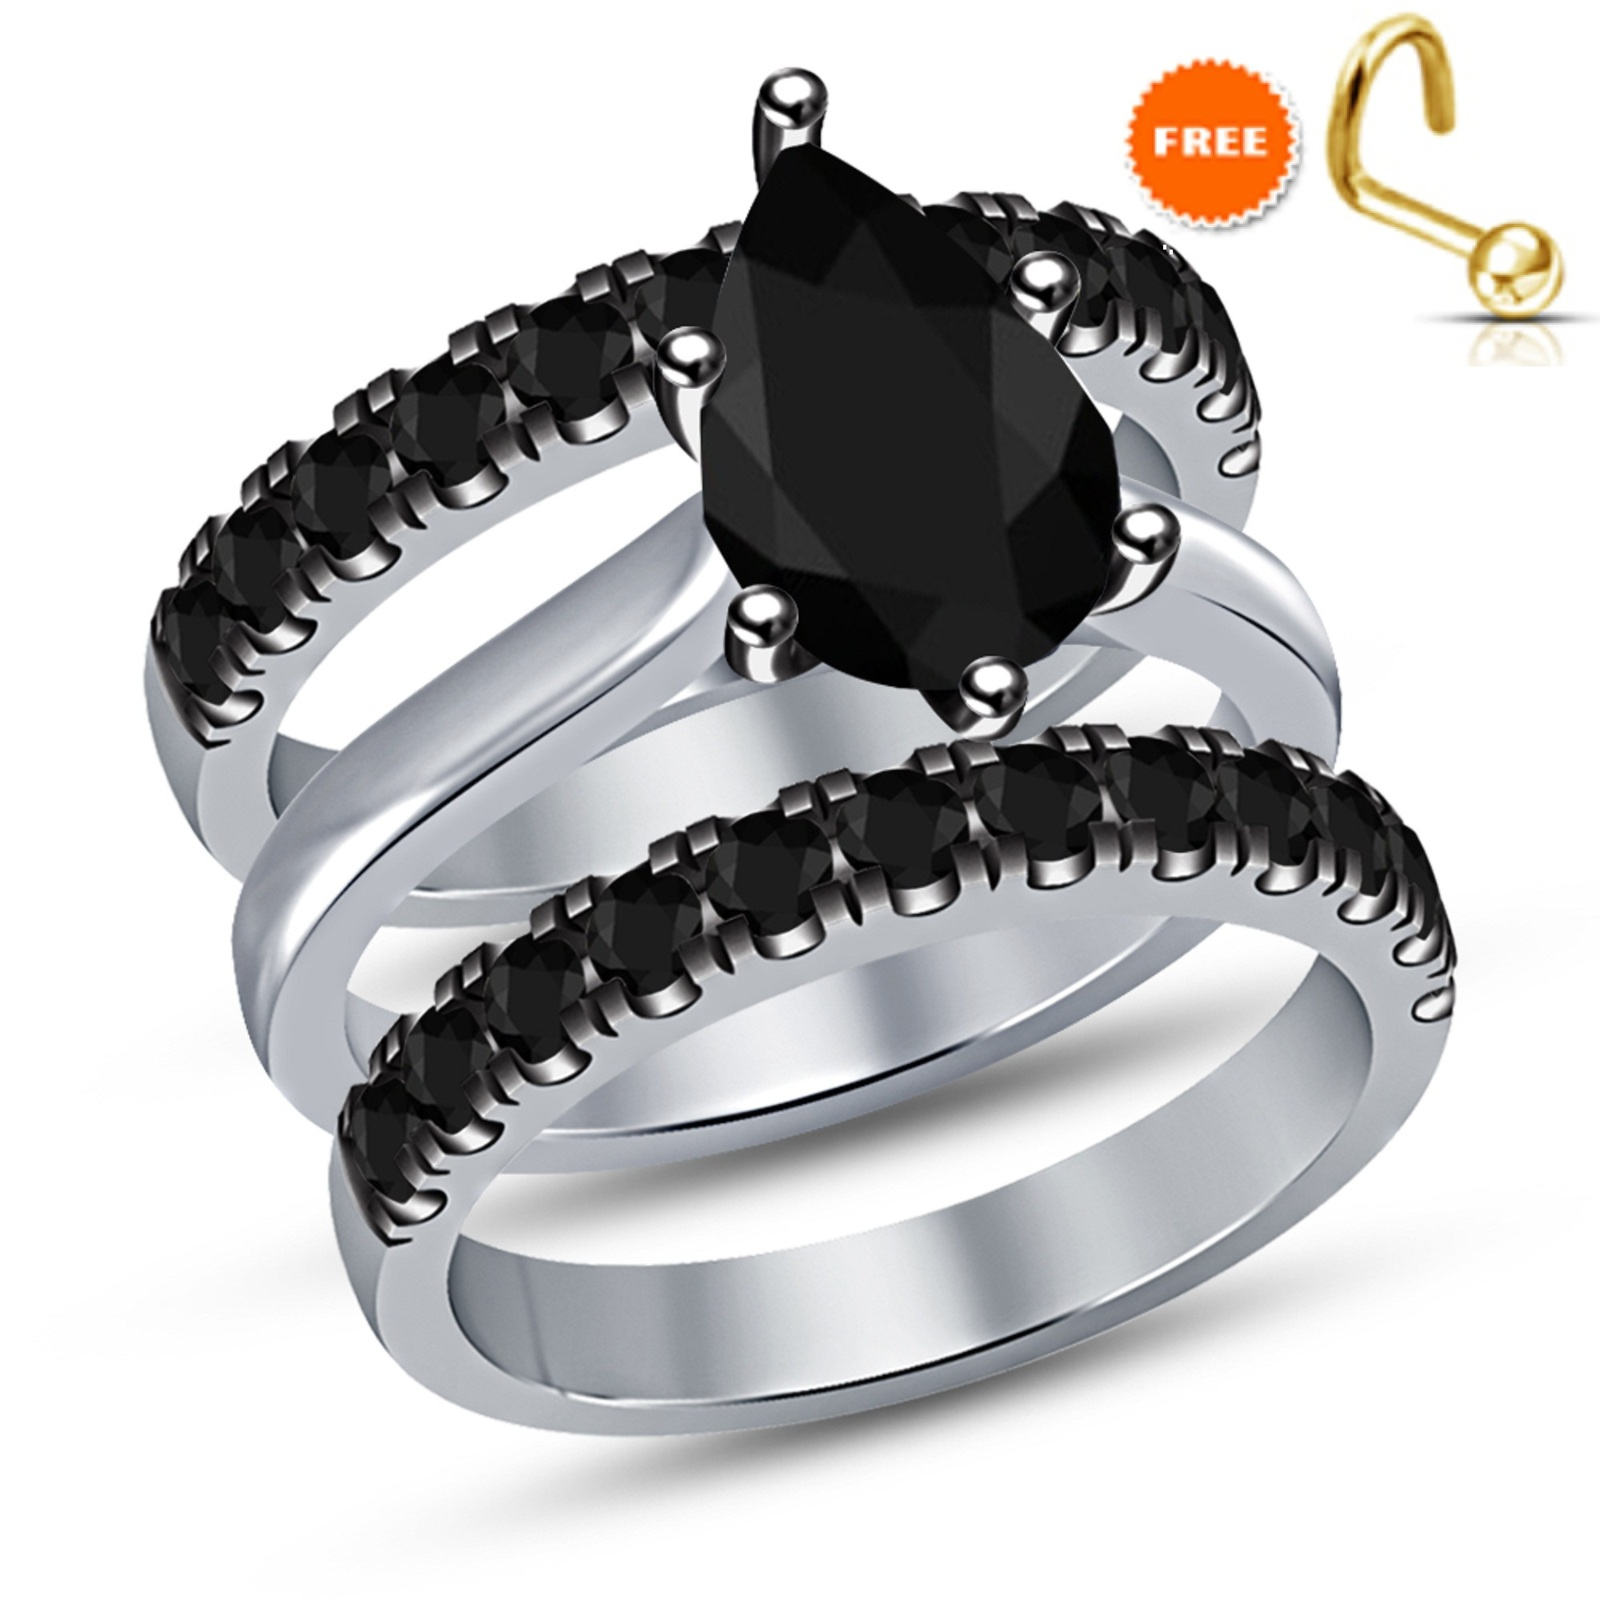 Pear Cut Halo Black Simulated Diamond Promise Bridal Ring Set 14k White Gold Fin - $102.33